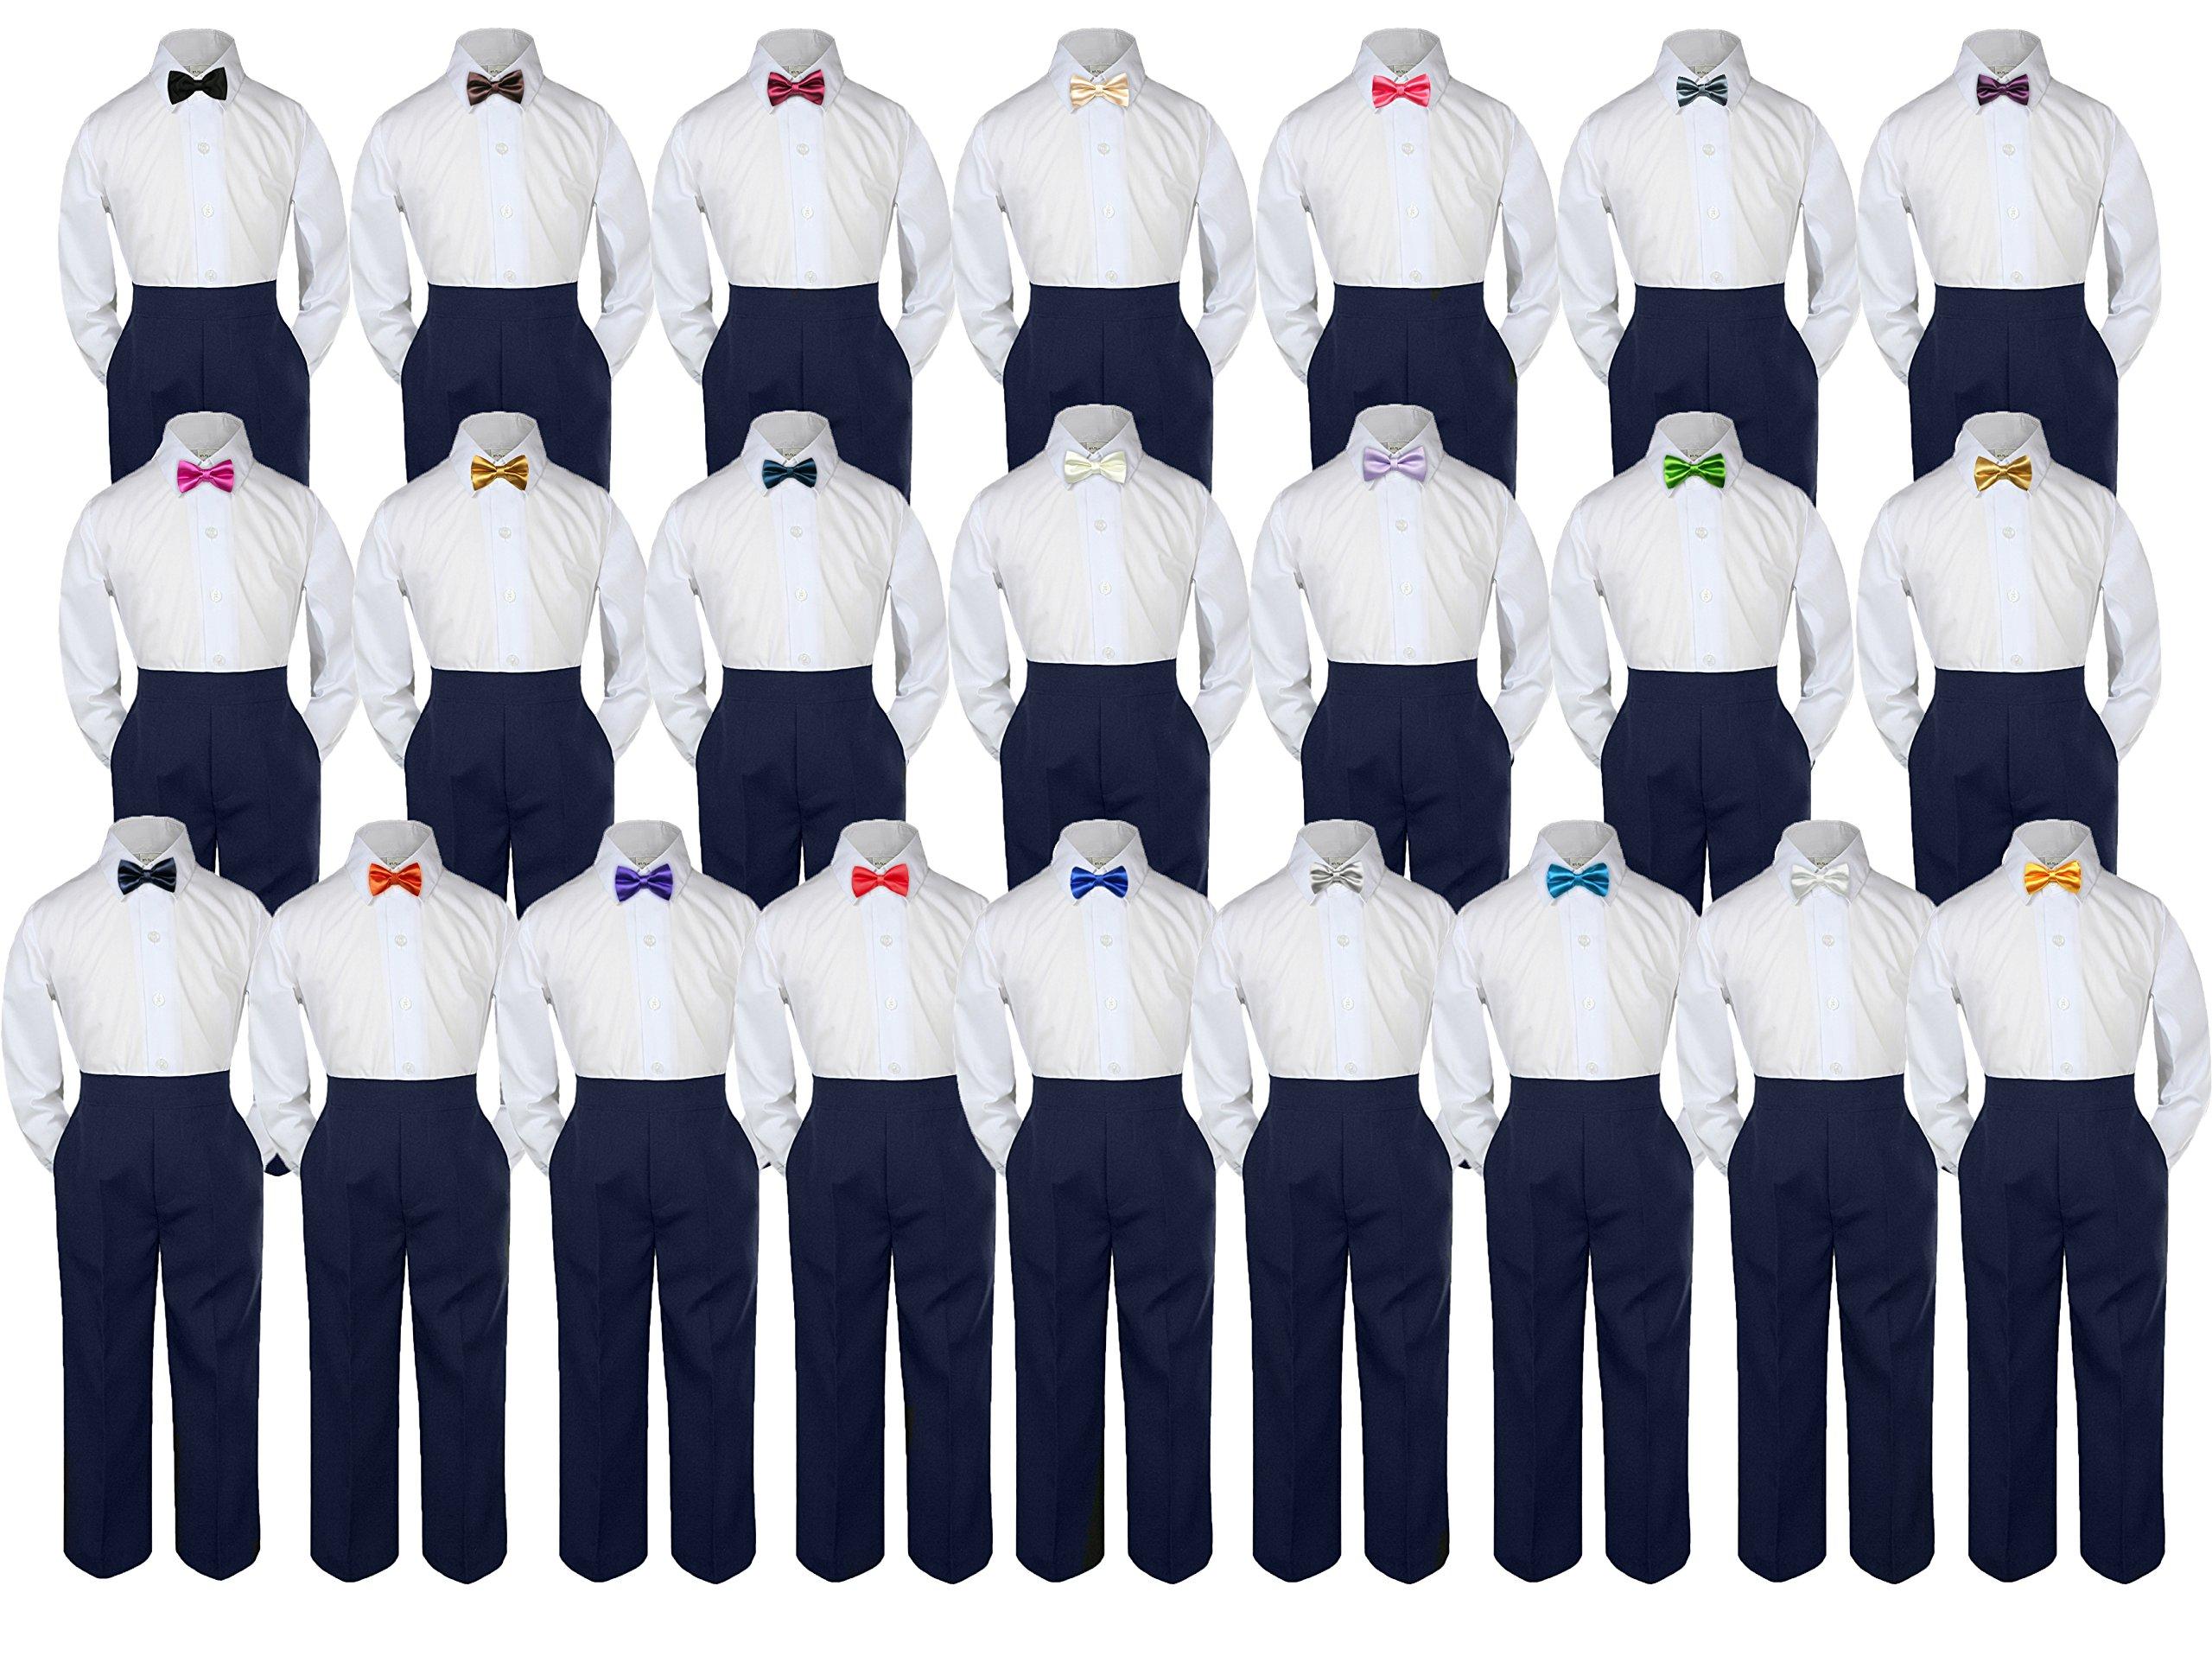 3pc Baby Toddler Boy Kid Party Wedding Suit NAVY Pants Shirt Bow Tie Set Sm-4T (Medium ( 6-12 Months ), Eggplant)